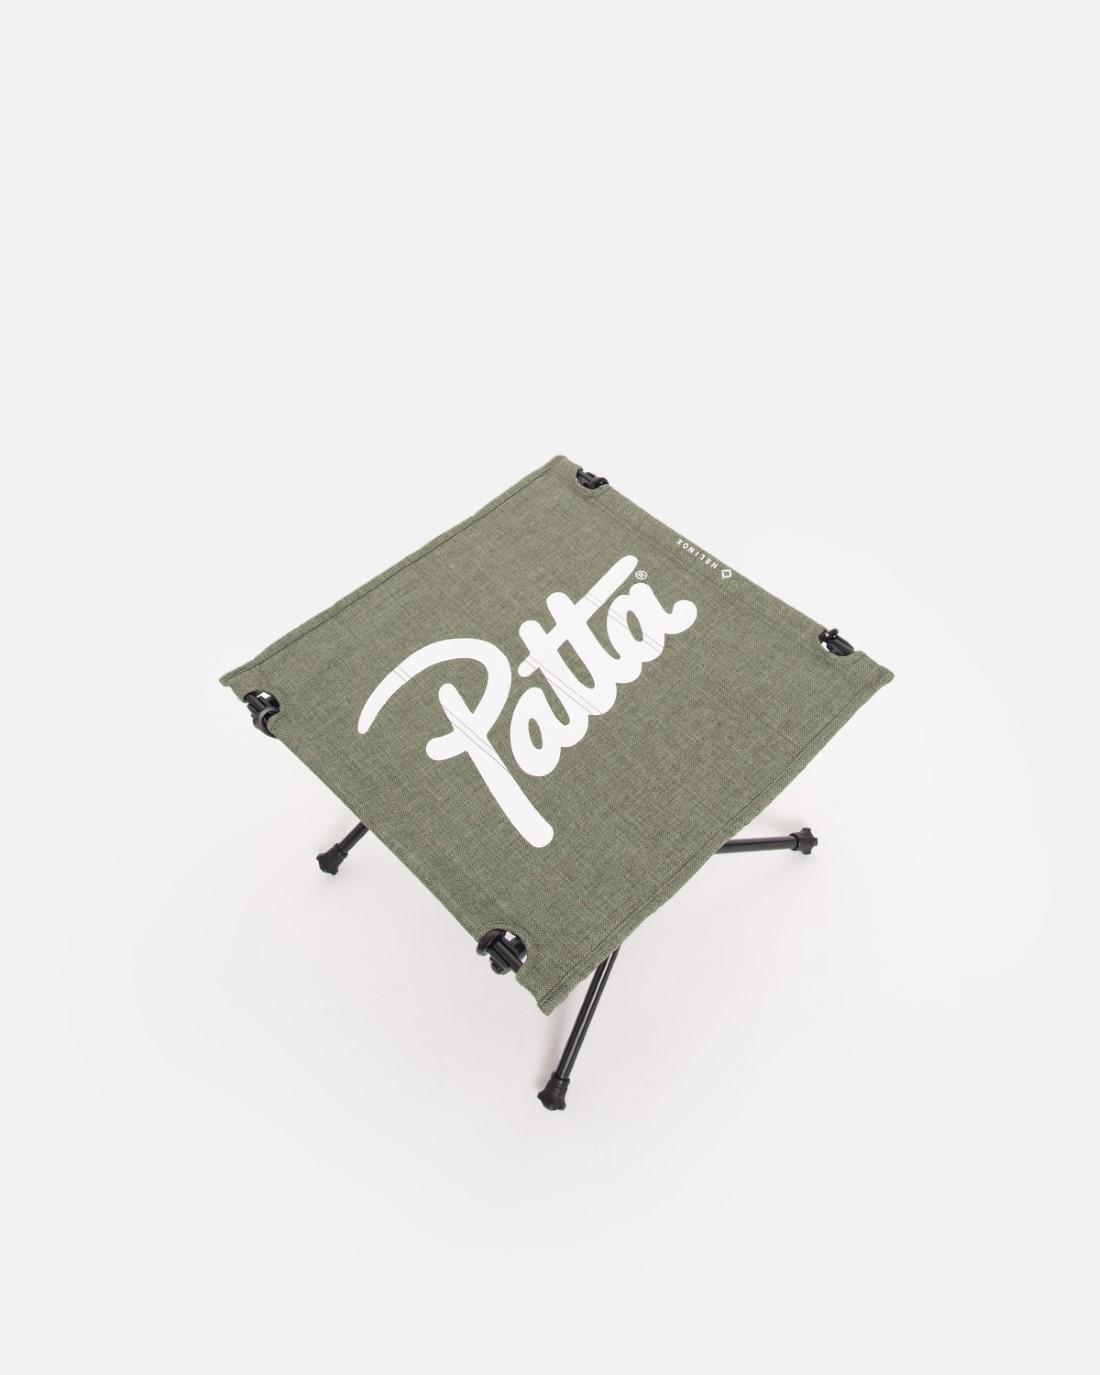 Helinox x Patta